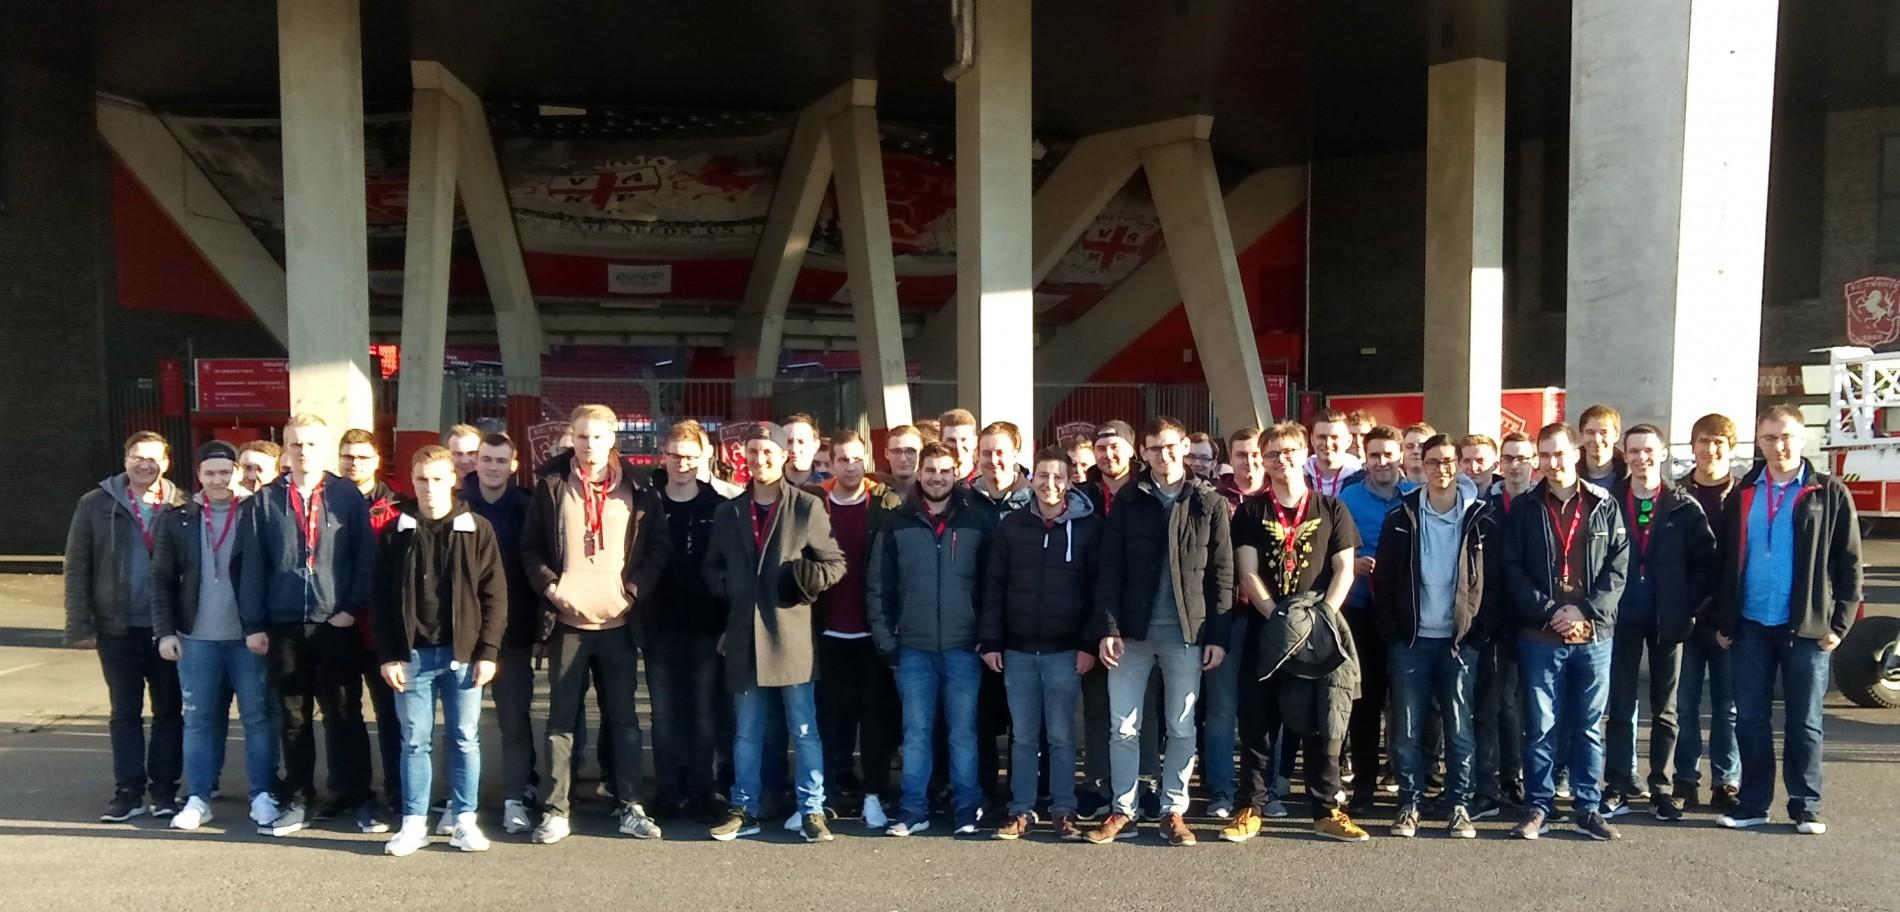 28 Universität Twente